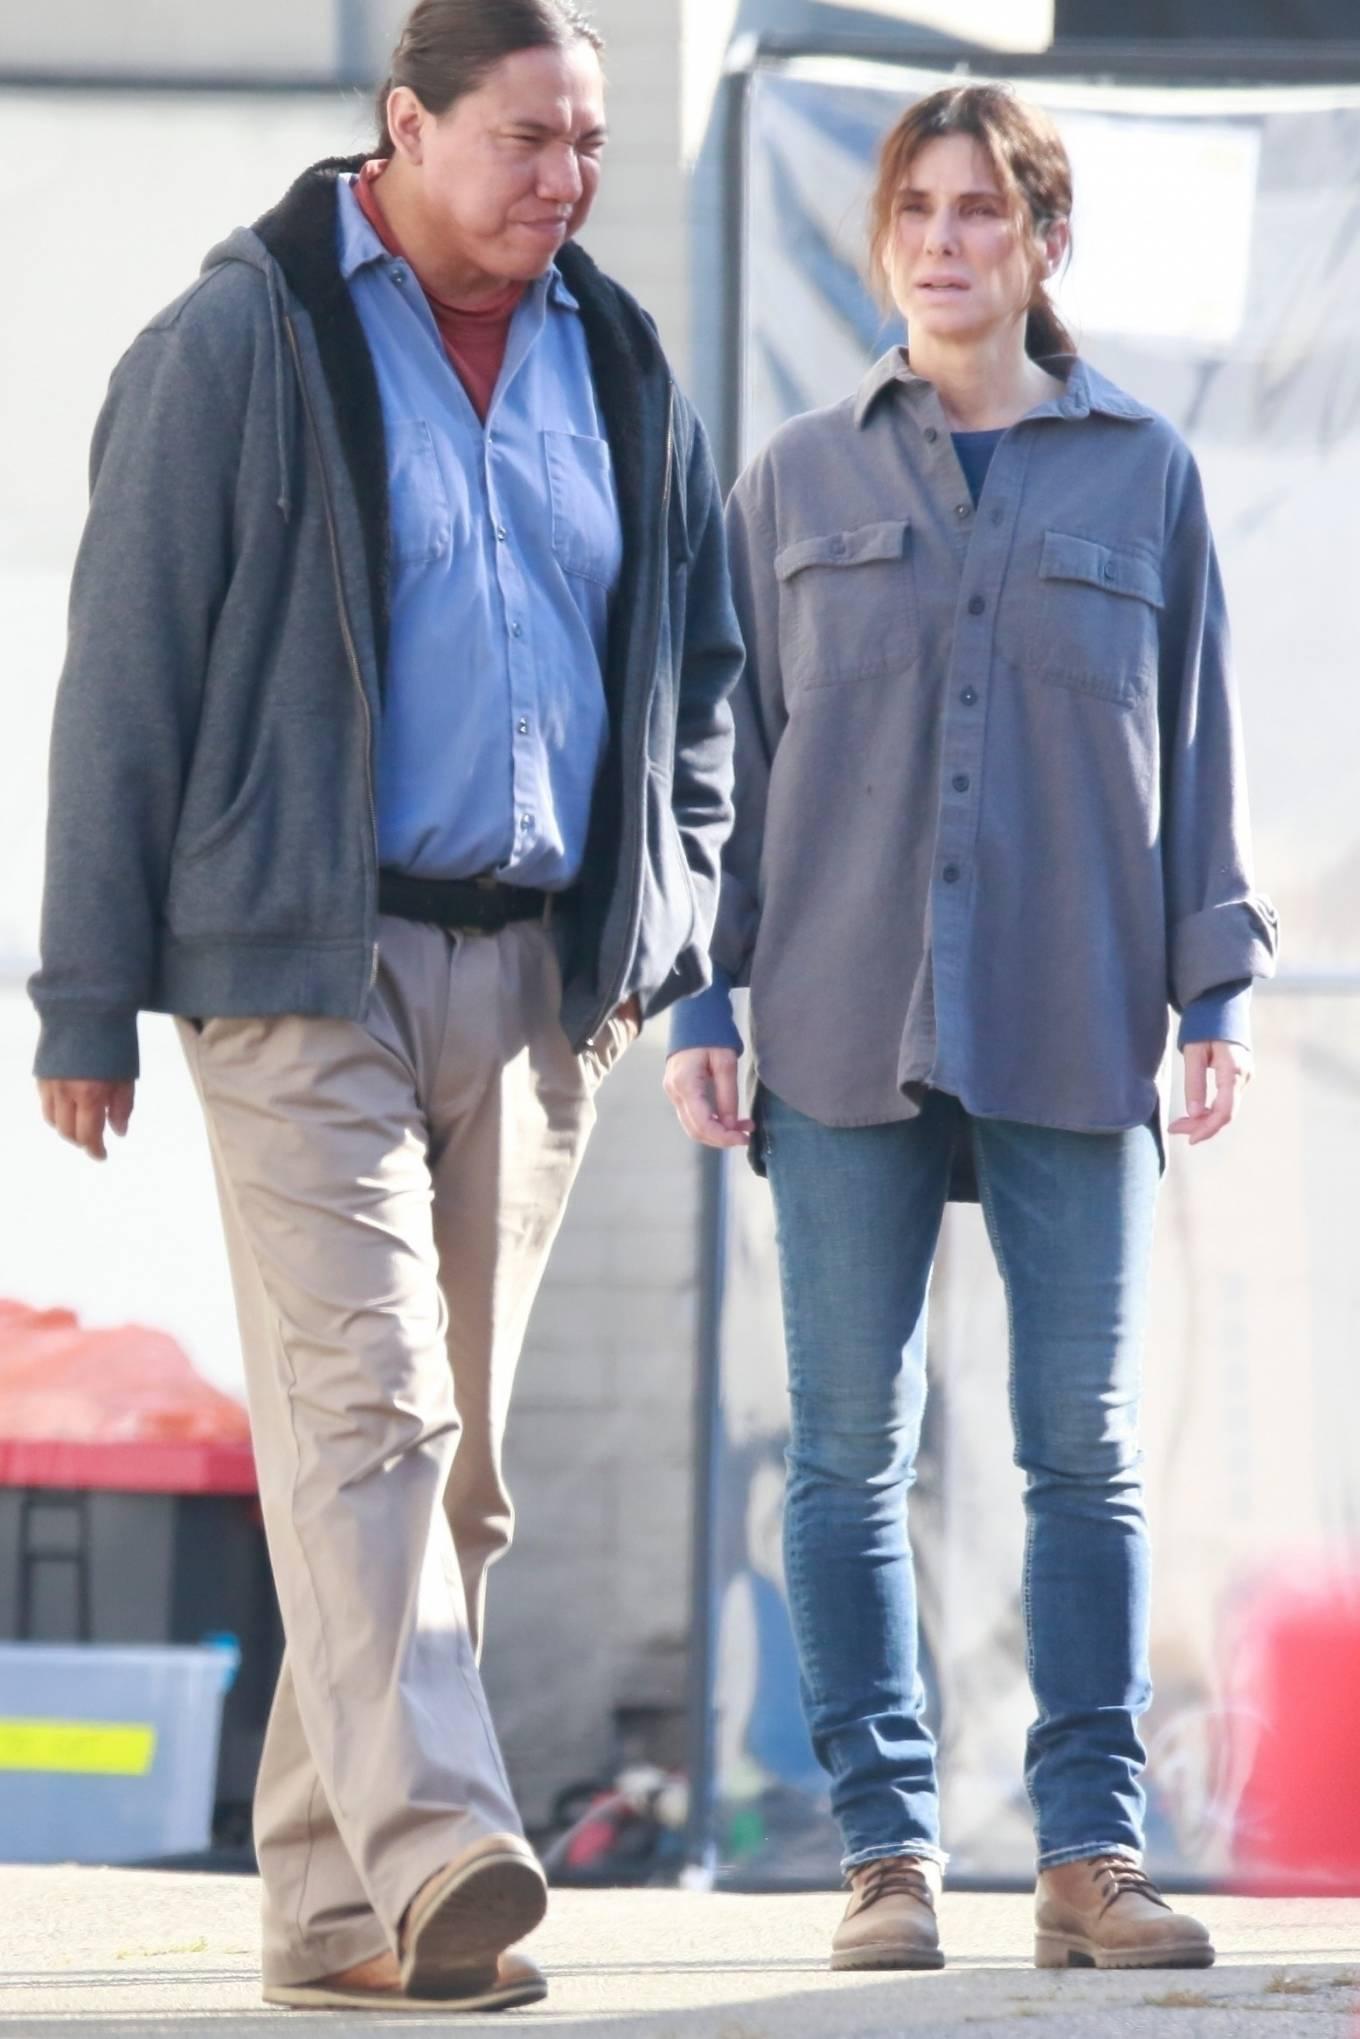 Sandra Bullock - Shoots a scene for Netflix film in Vancouver